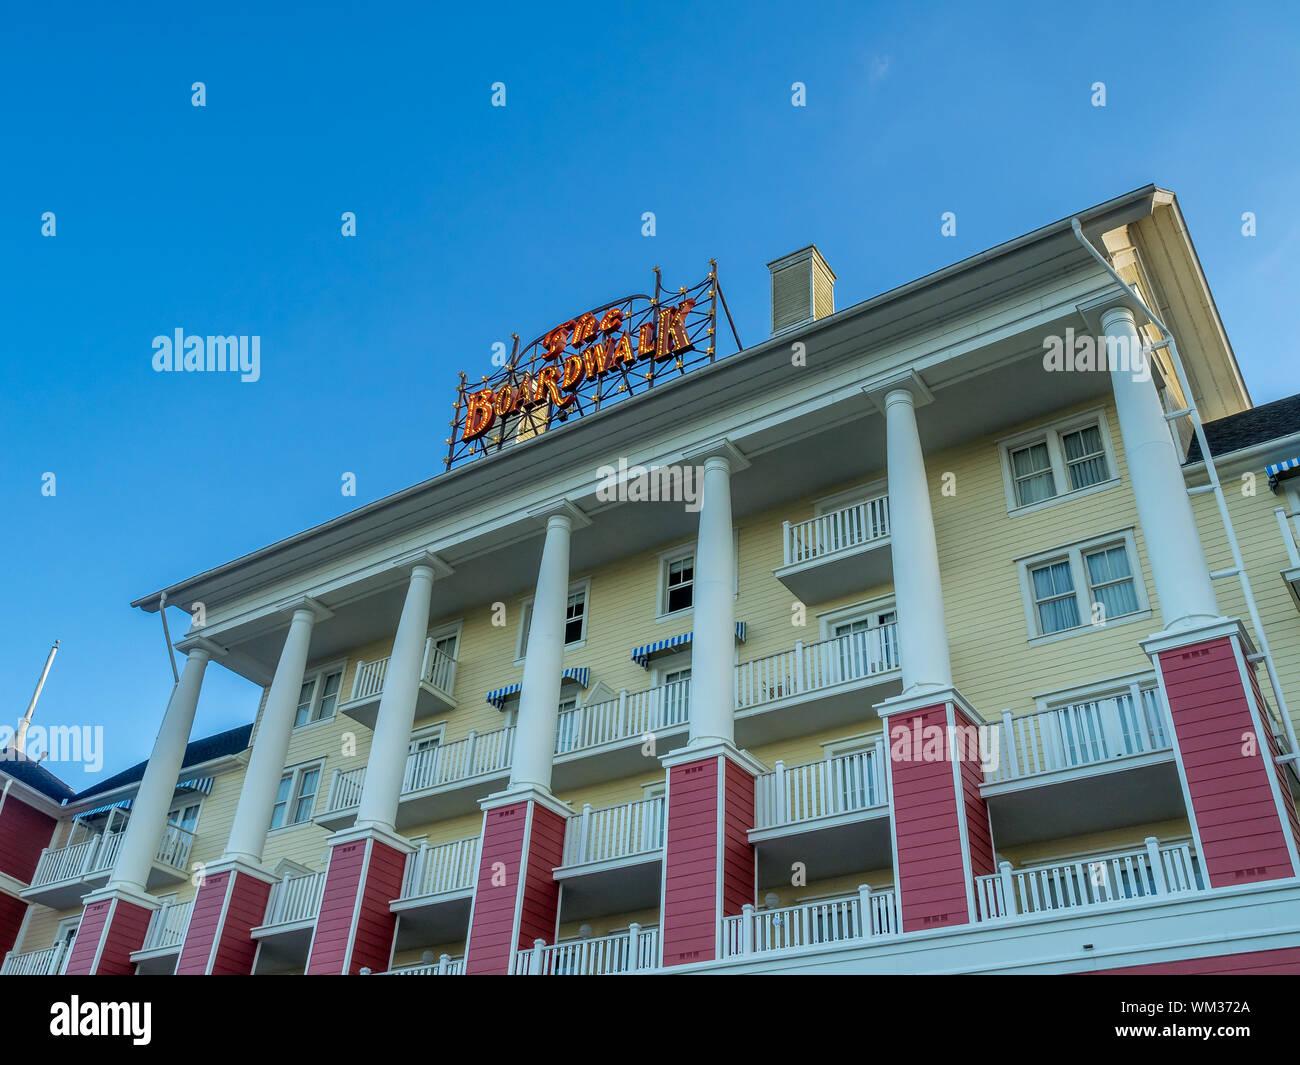 Hotels at the Disney World resort close to Orlando, Florida. Stock Photo